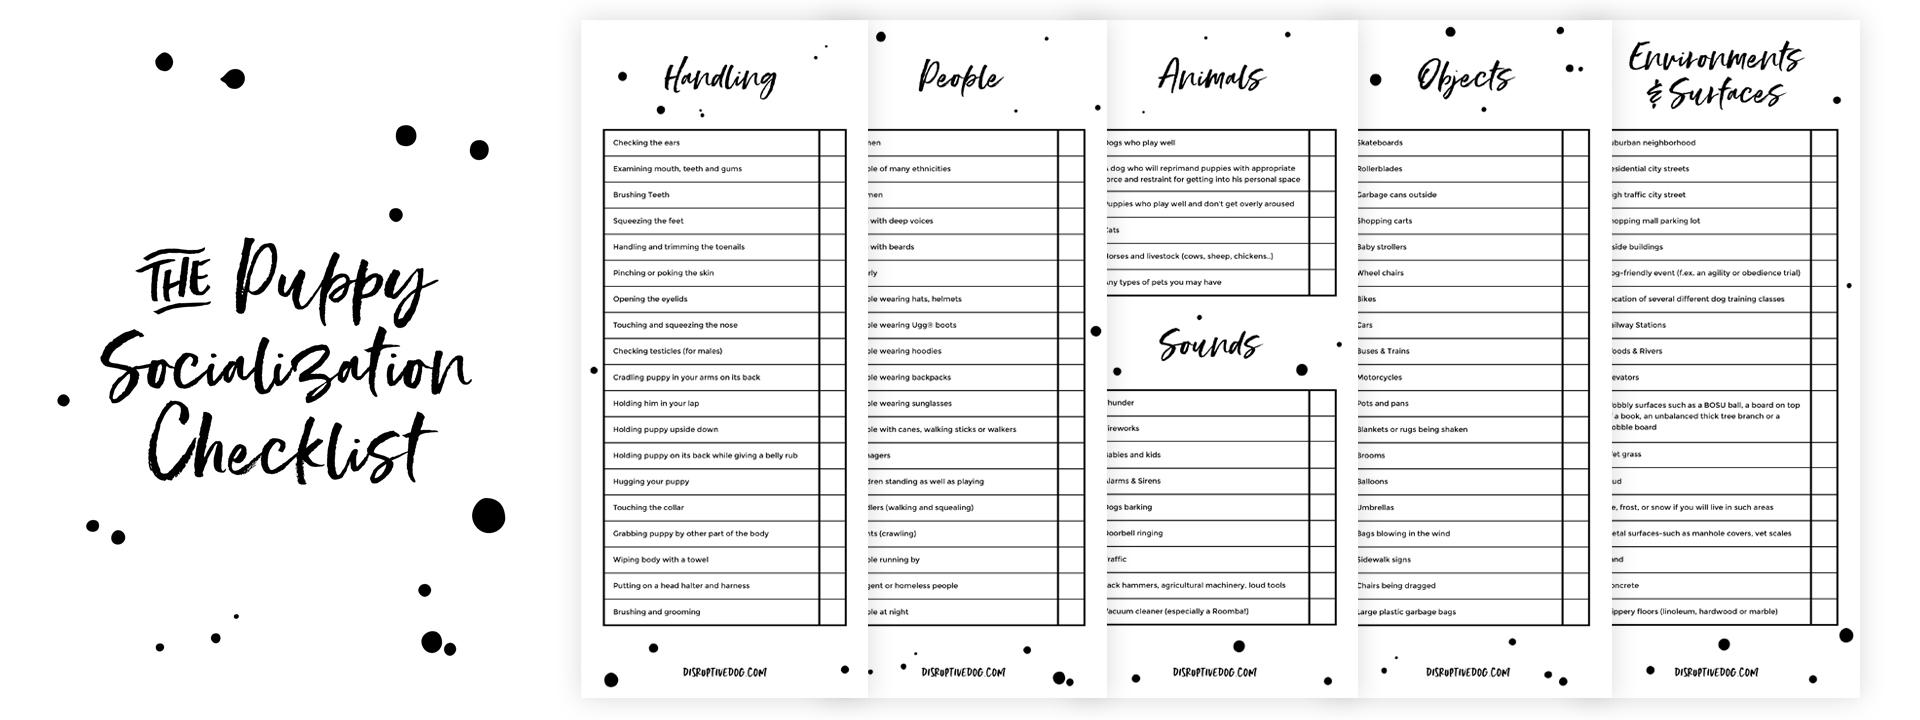 Puppy Socialization Checklist by DisruptiveDog